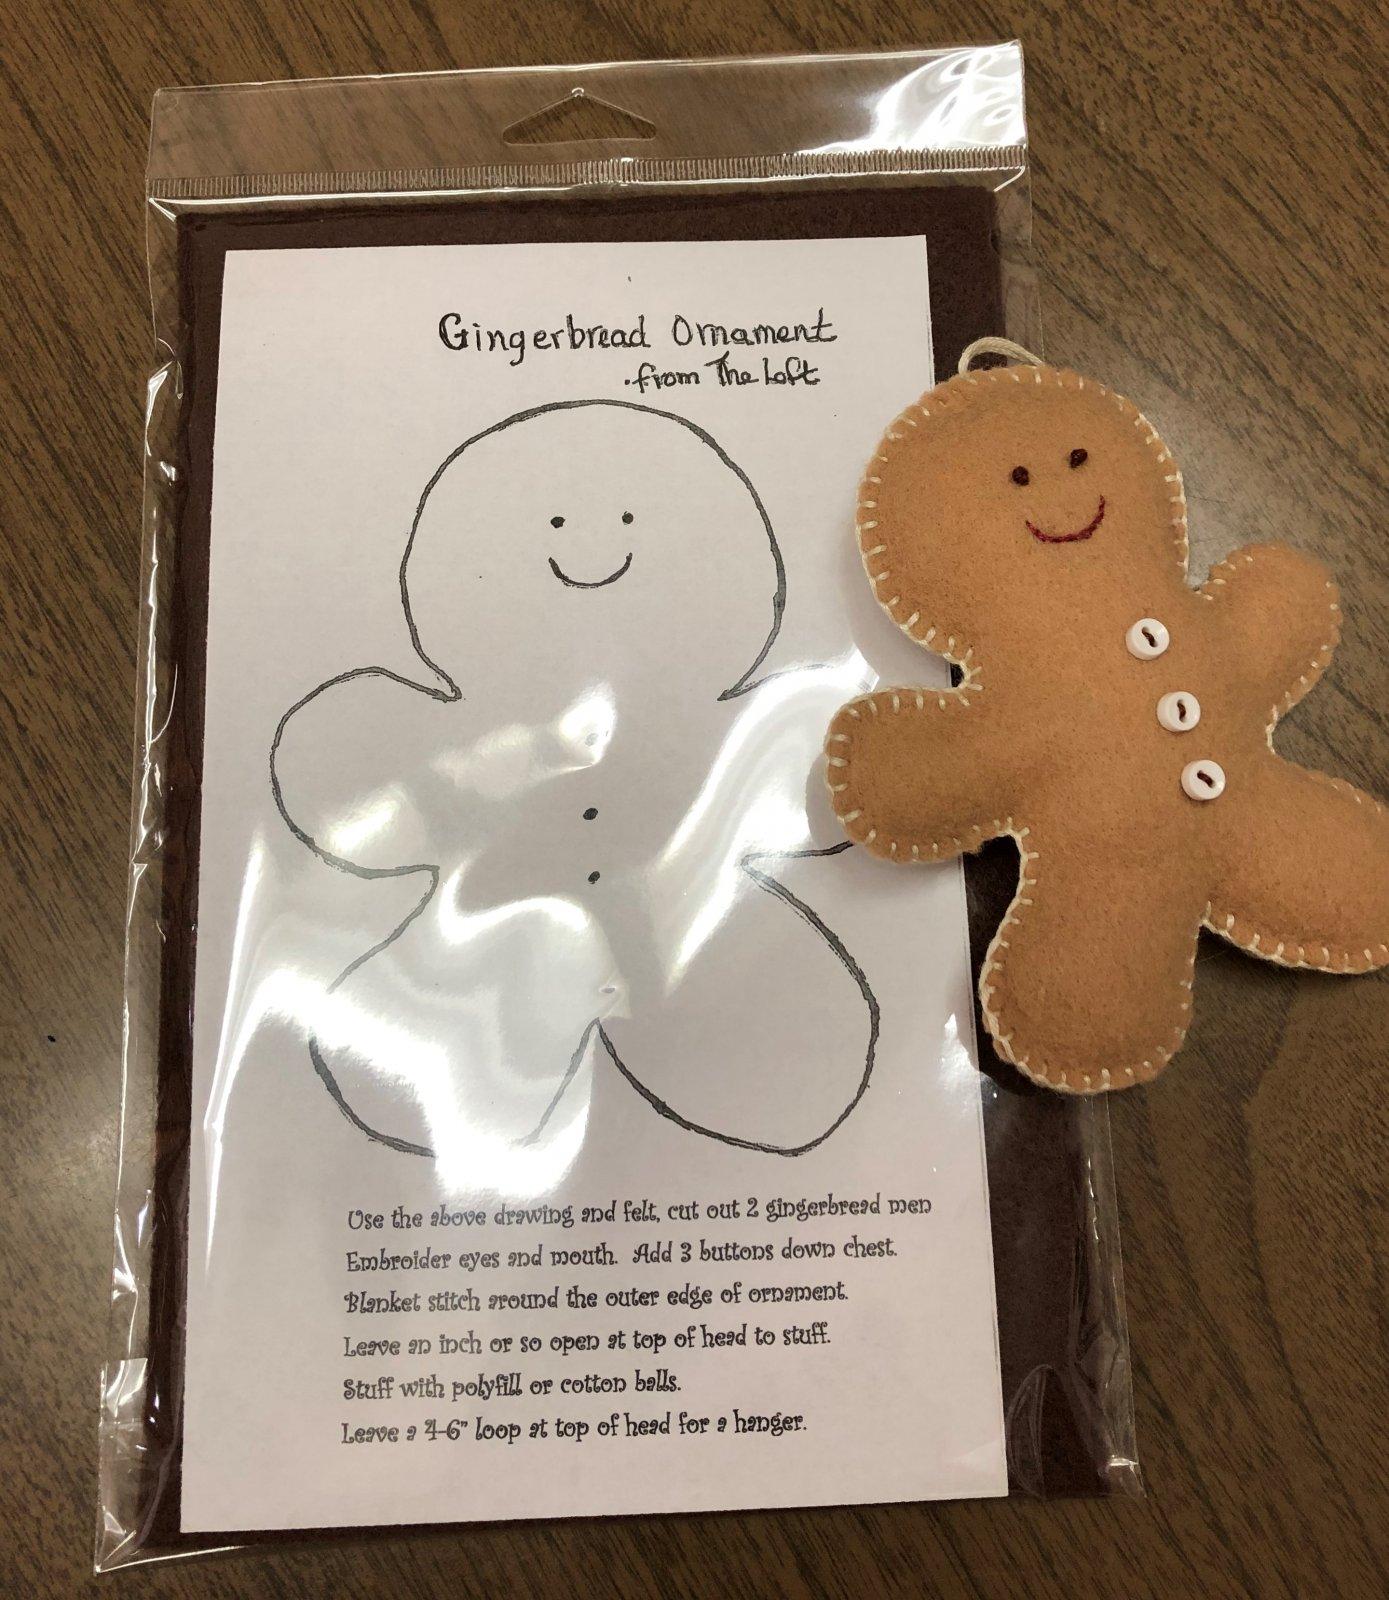 Gingerbread Ornament Kit